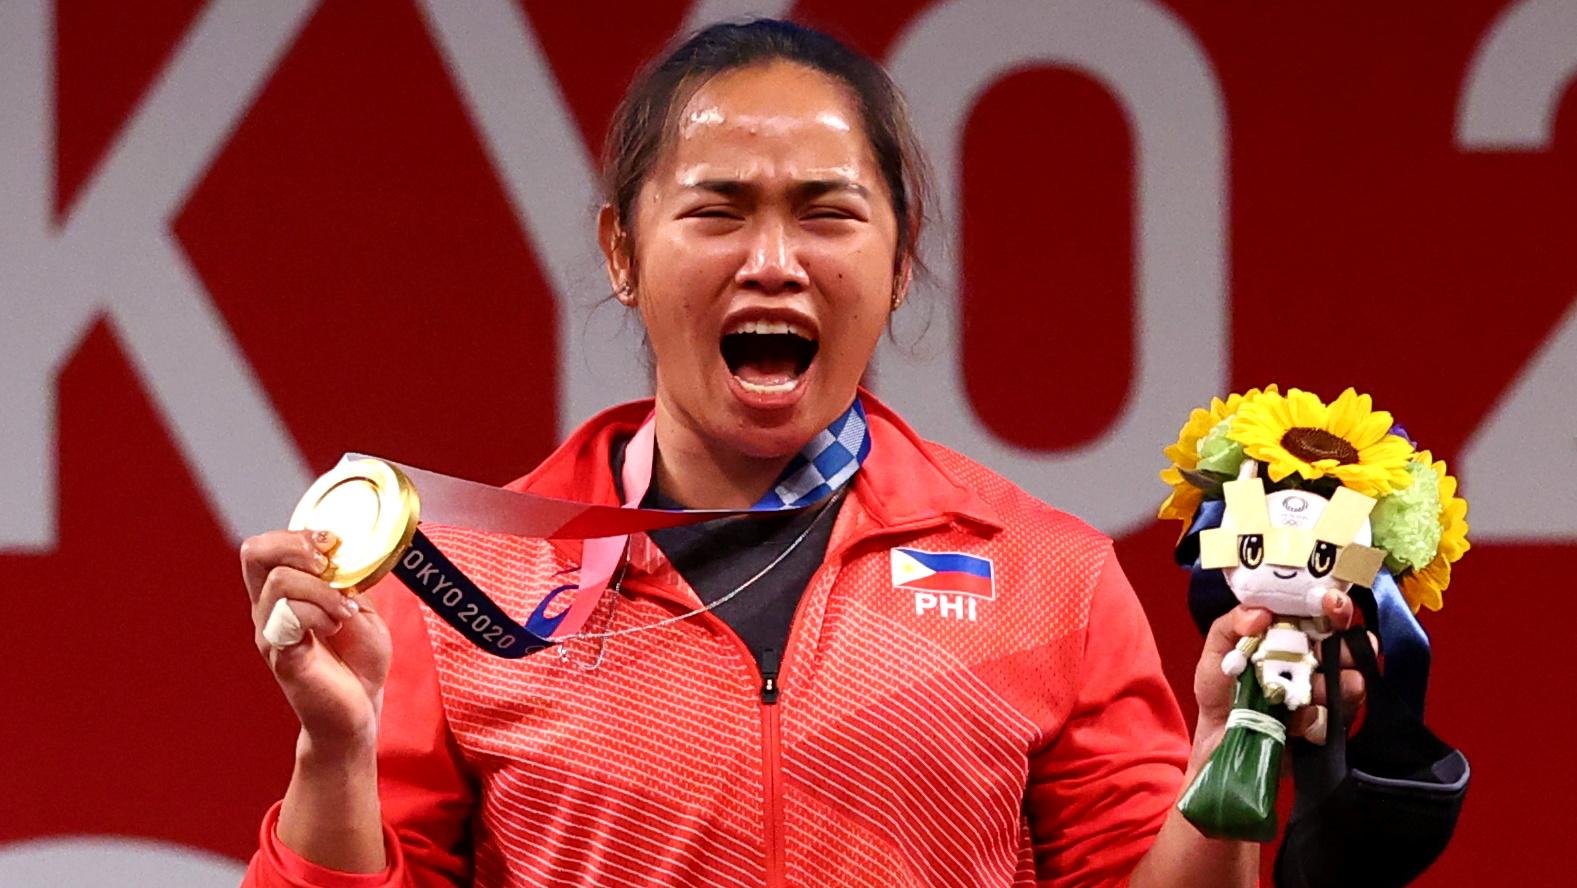 Tokyo 2020 Olympics - Weightlifting - Women's 55kg - Medal Ceremony - Tokyo International Forum, Tokyo, Japan - July 26, 2021. Gold medalist Hidilyn Diaz of the Philippines reacts. REUTERS/Edgard Garrido